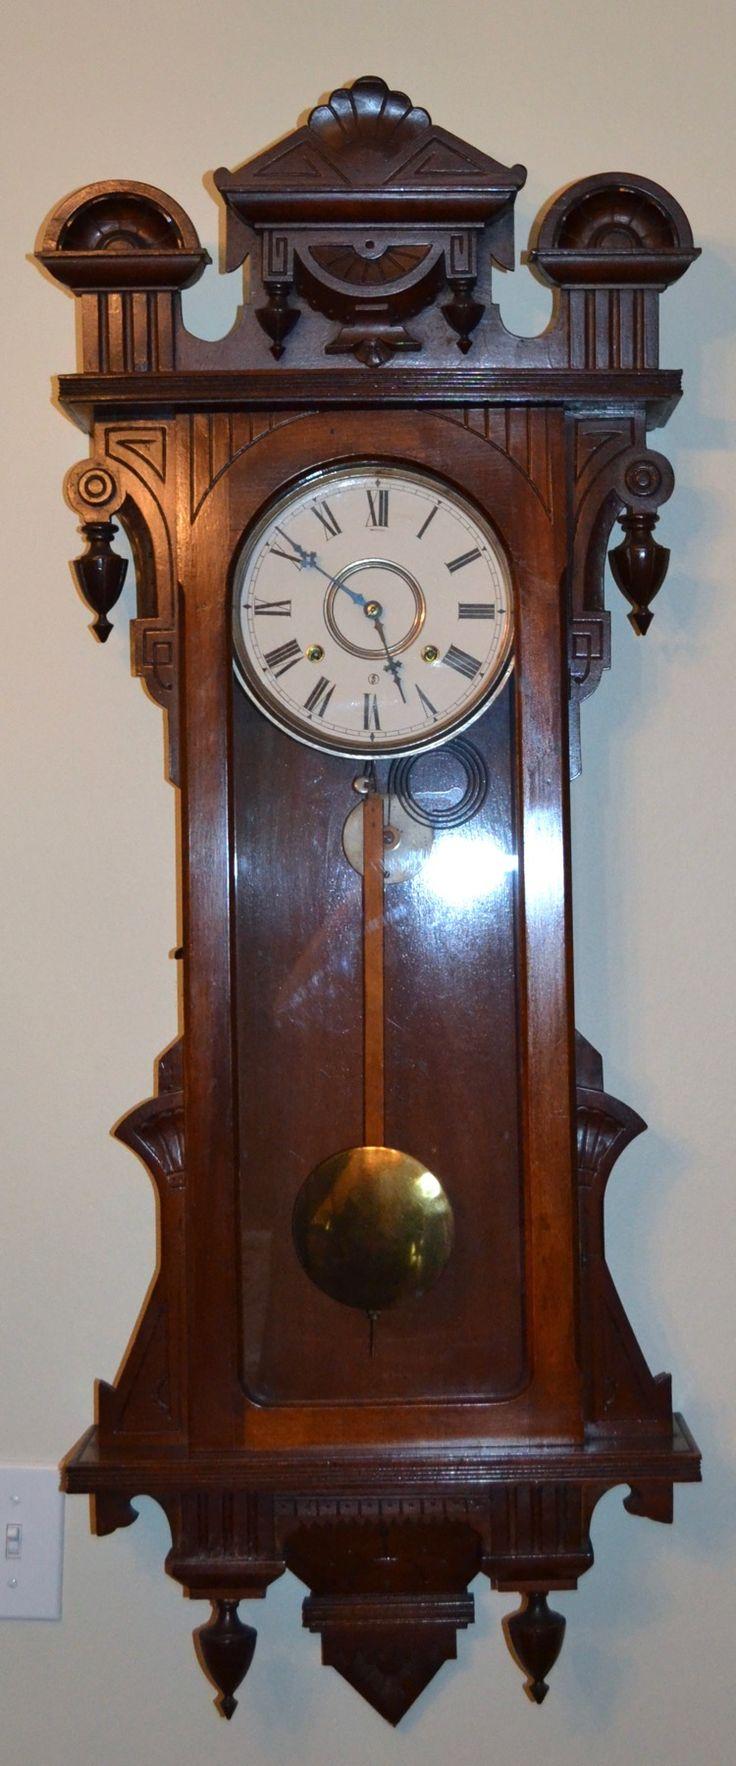 Early 20th century American pendulum clock